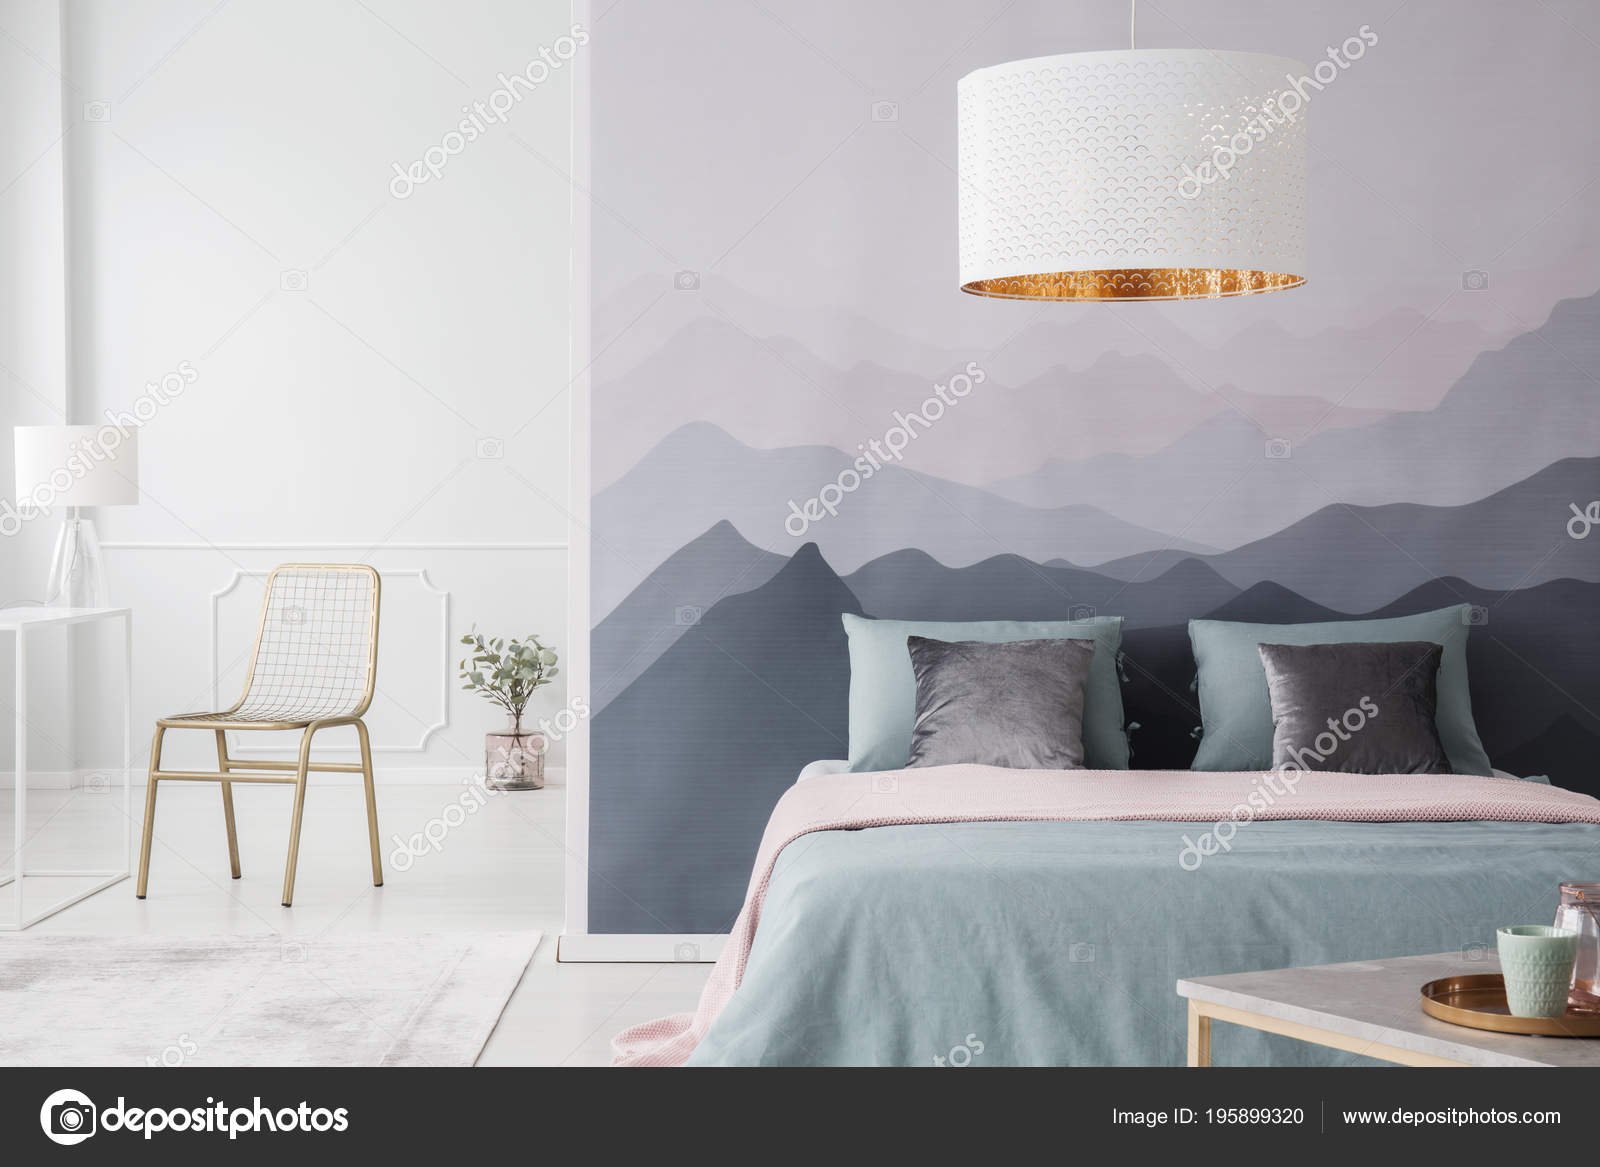 Roze Slaapkamer Stoel : Wit licht boven roze groene bed ruime slaapkamer interieur met